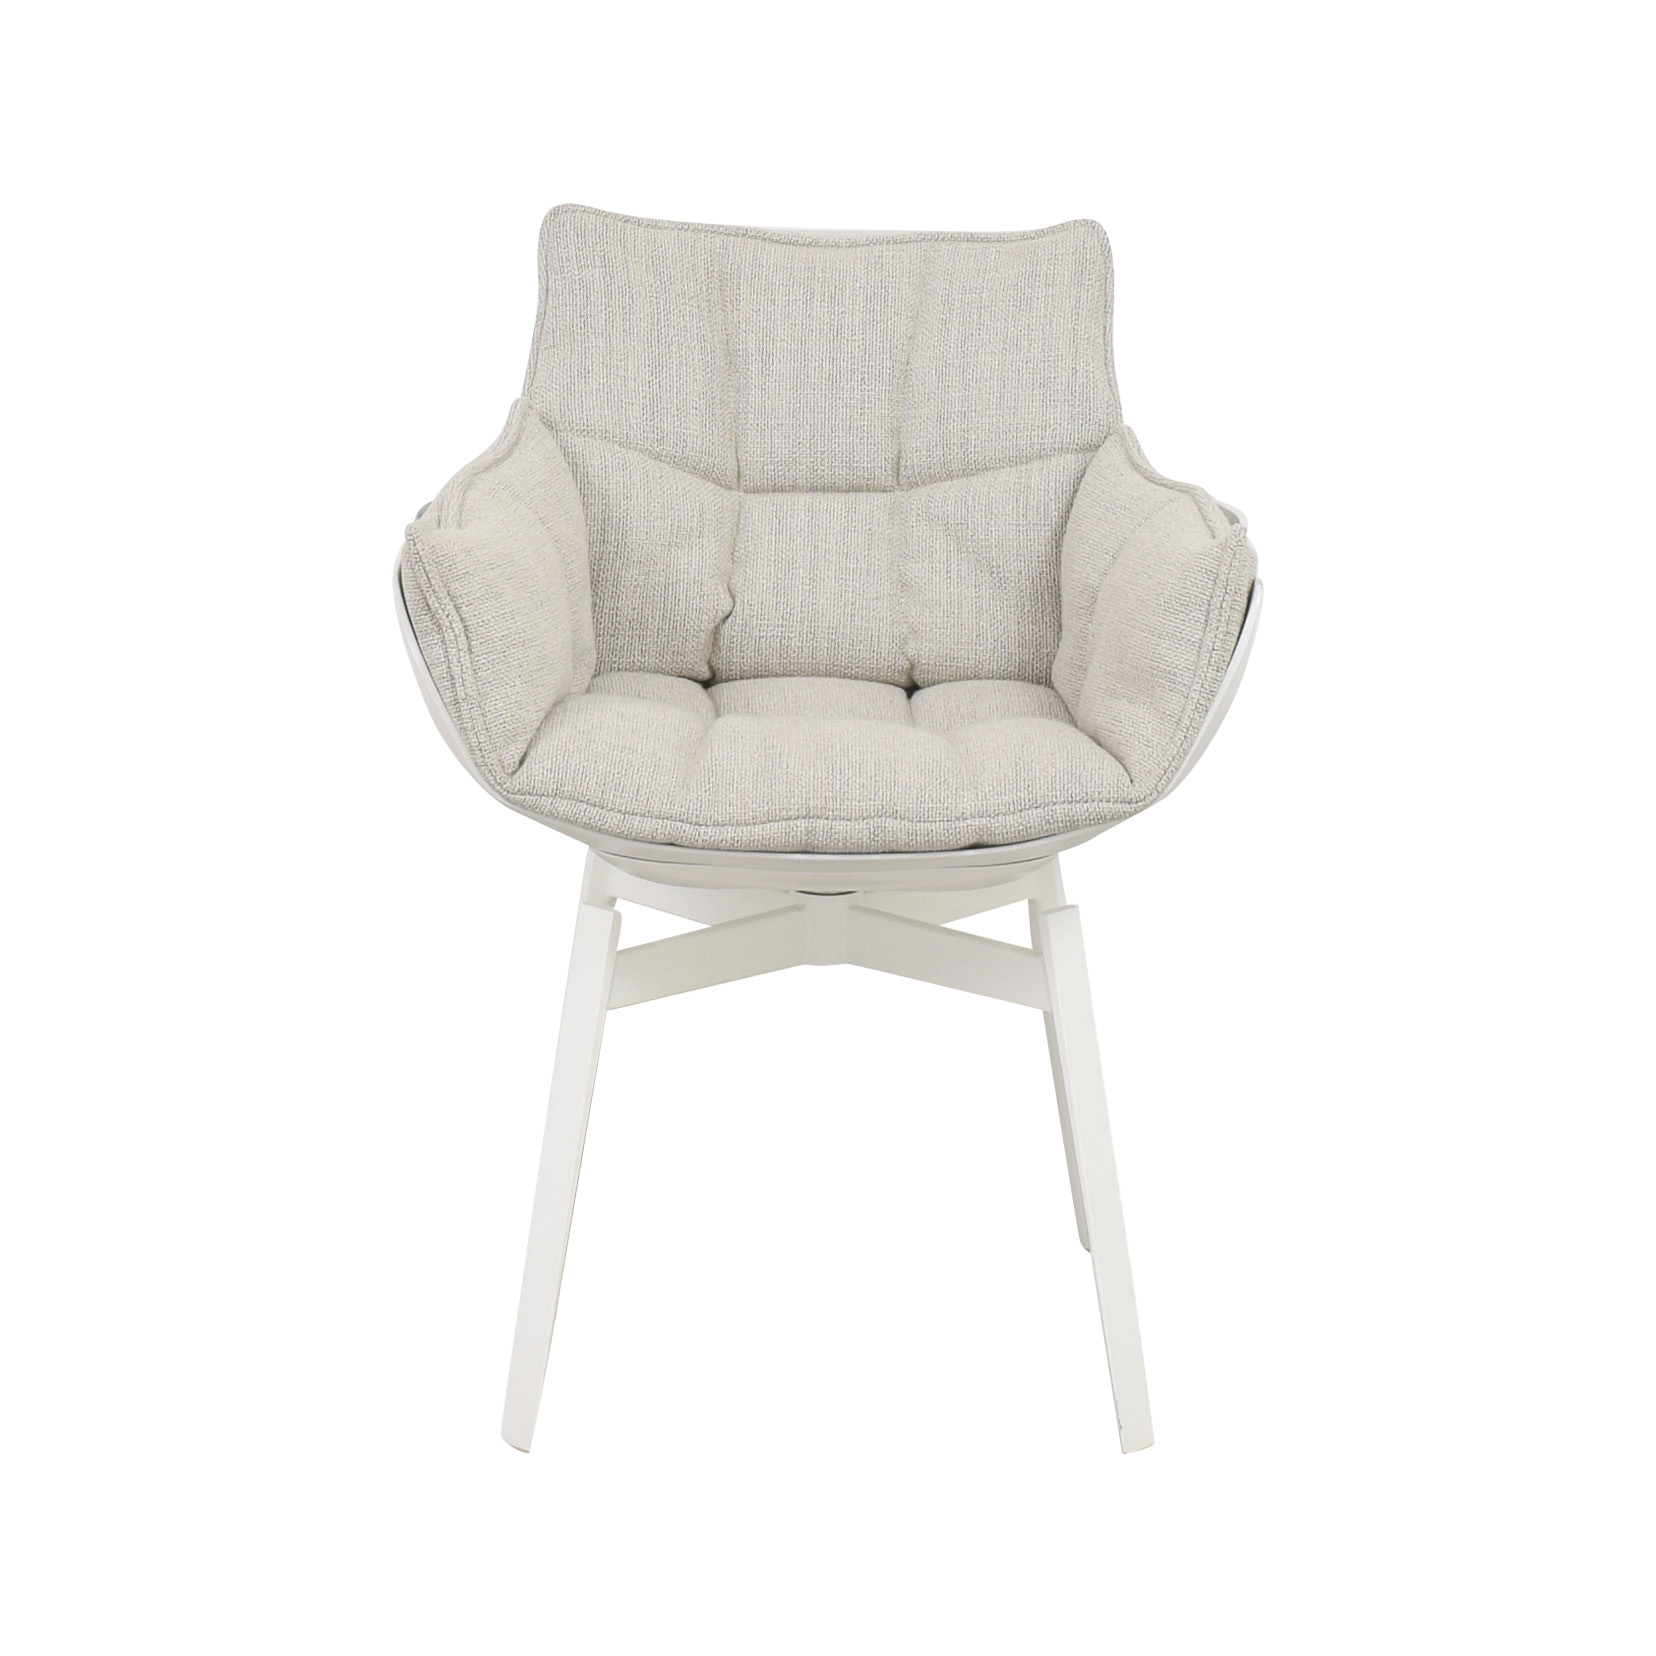 B&B Italia B&B Italia Husk Chair nyc